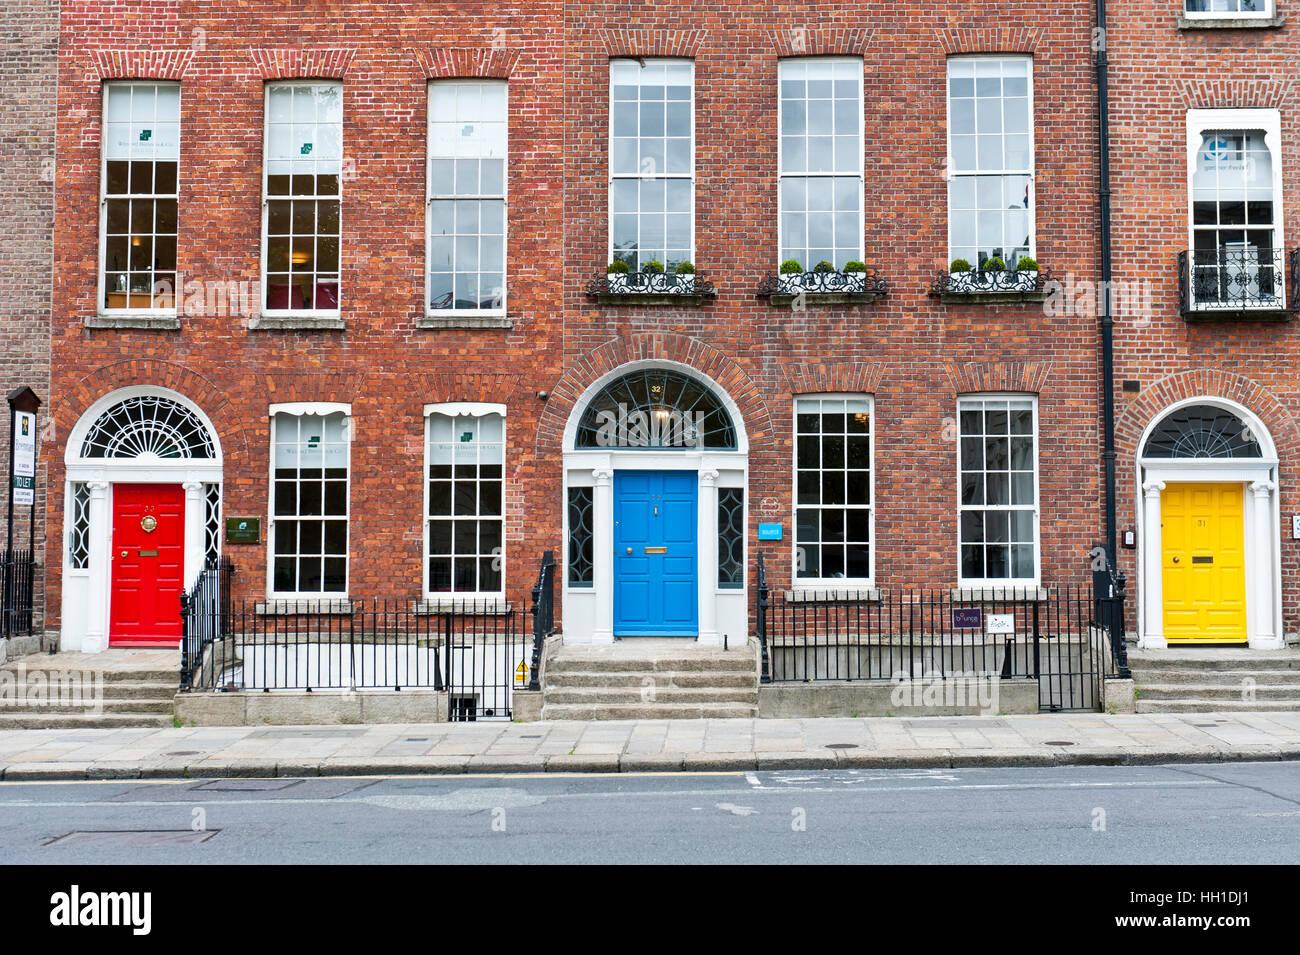 Rouge, bleu et jaune, portes architecture Georgienne, Merrion Street, Dublin, Irlande Photo Stock